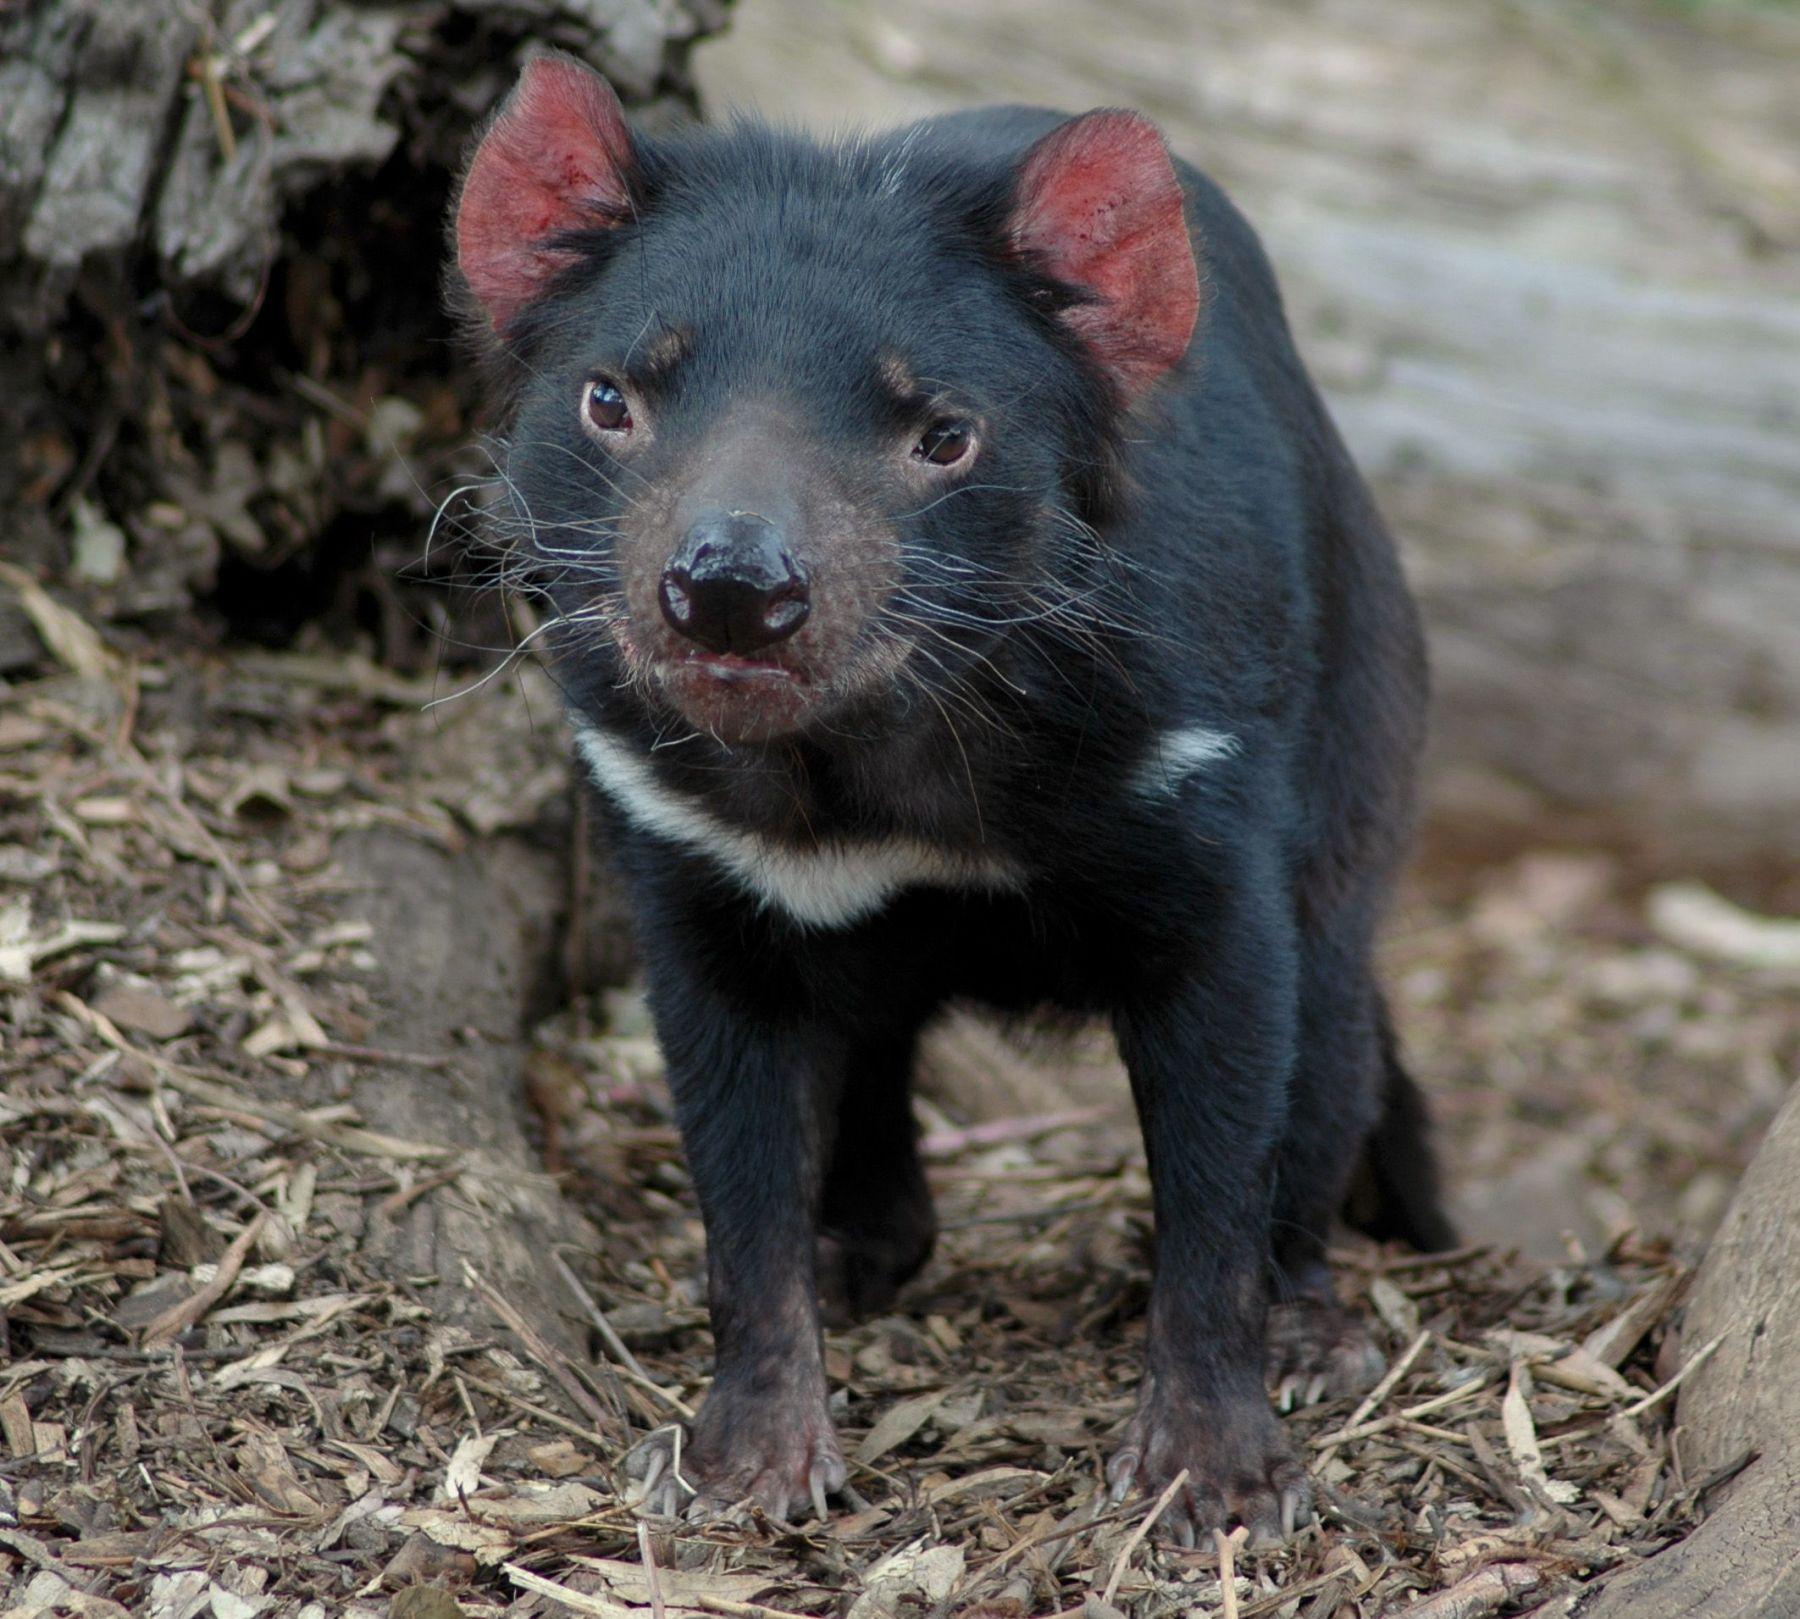 Tasmanian devil poo reveals new genetic variations for the endangered species